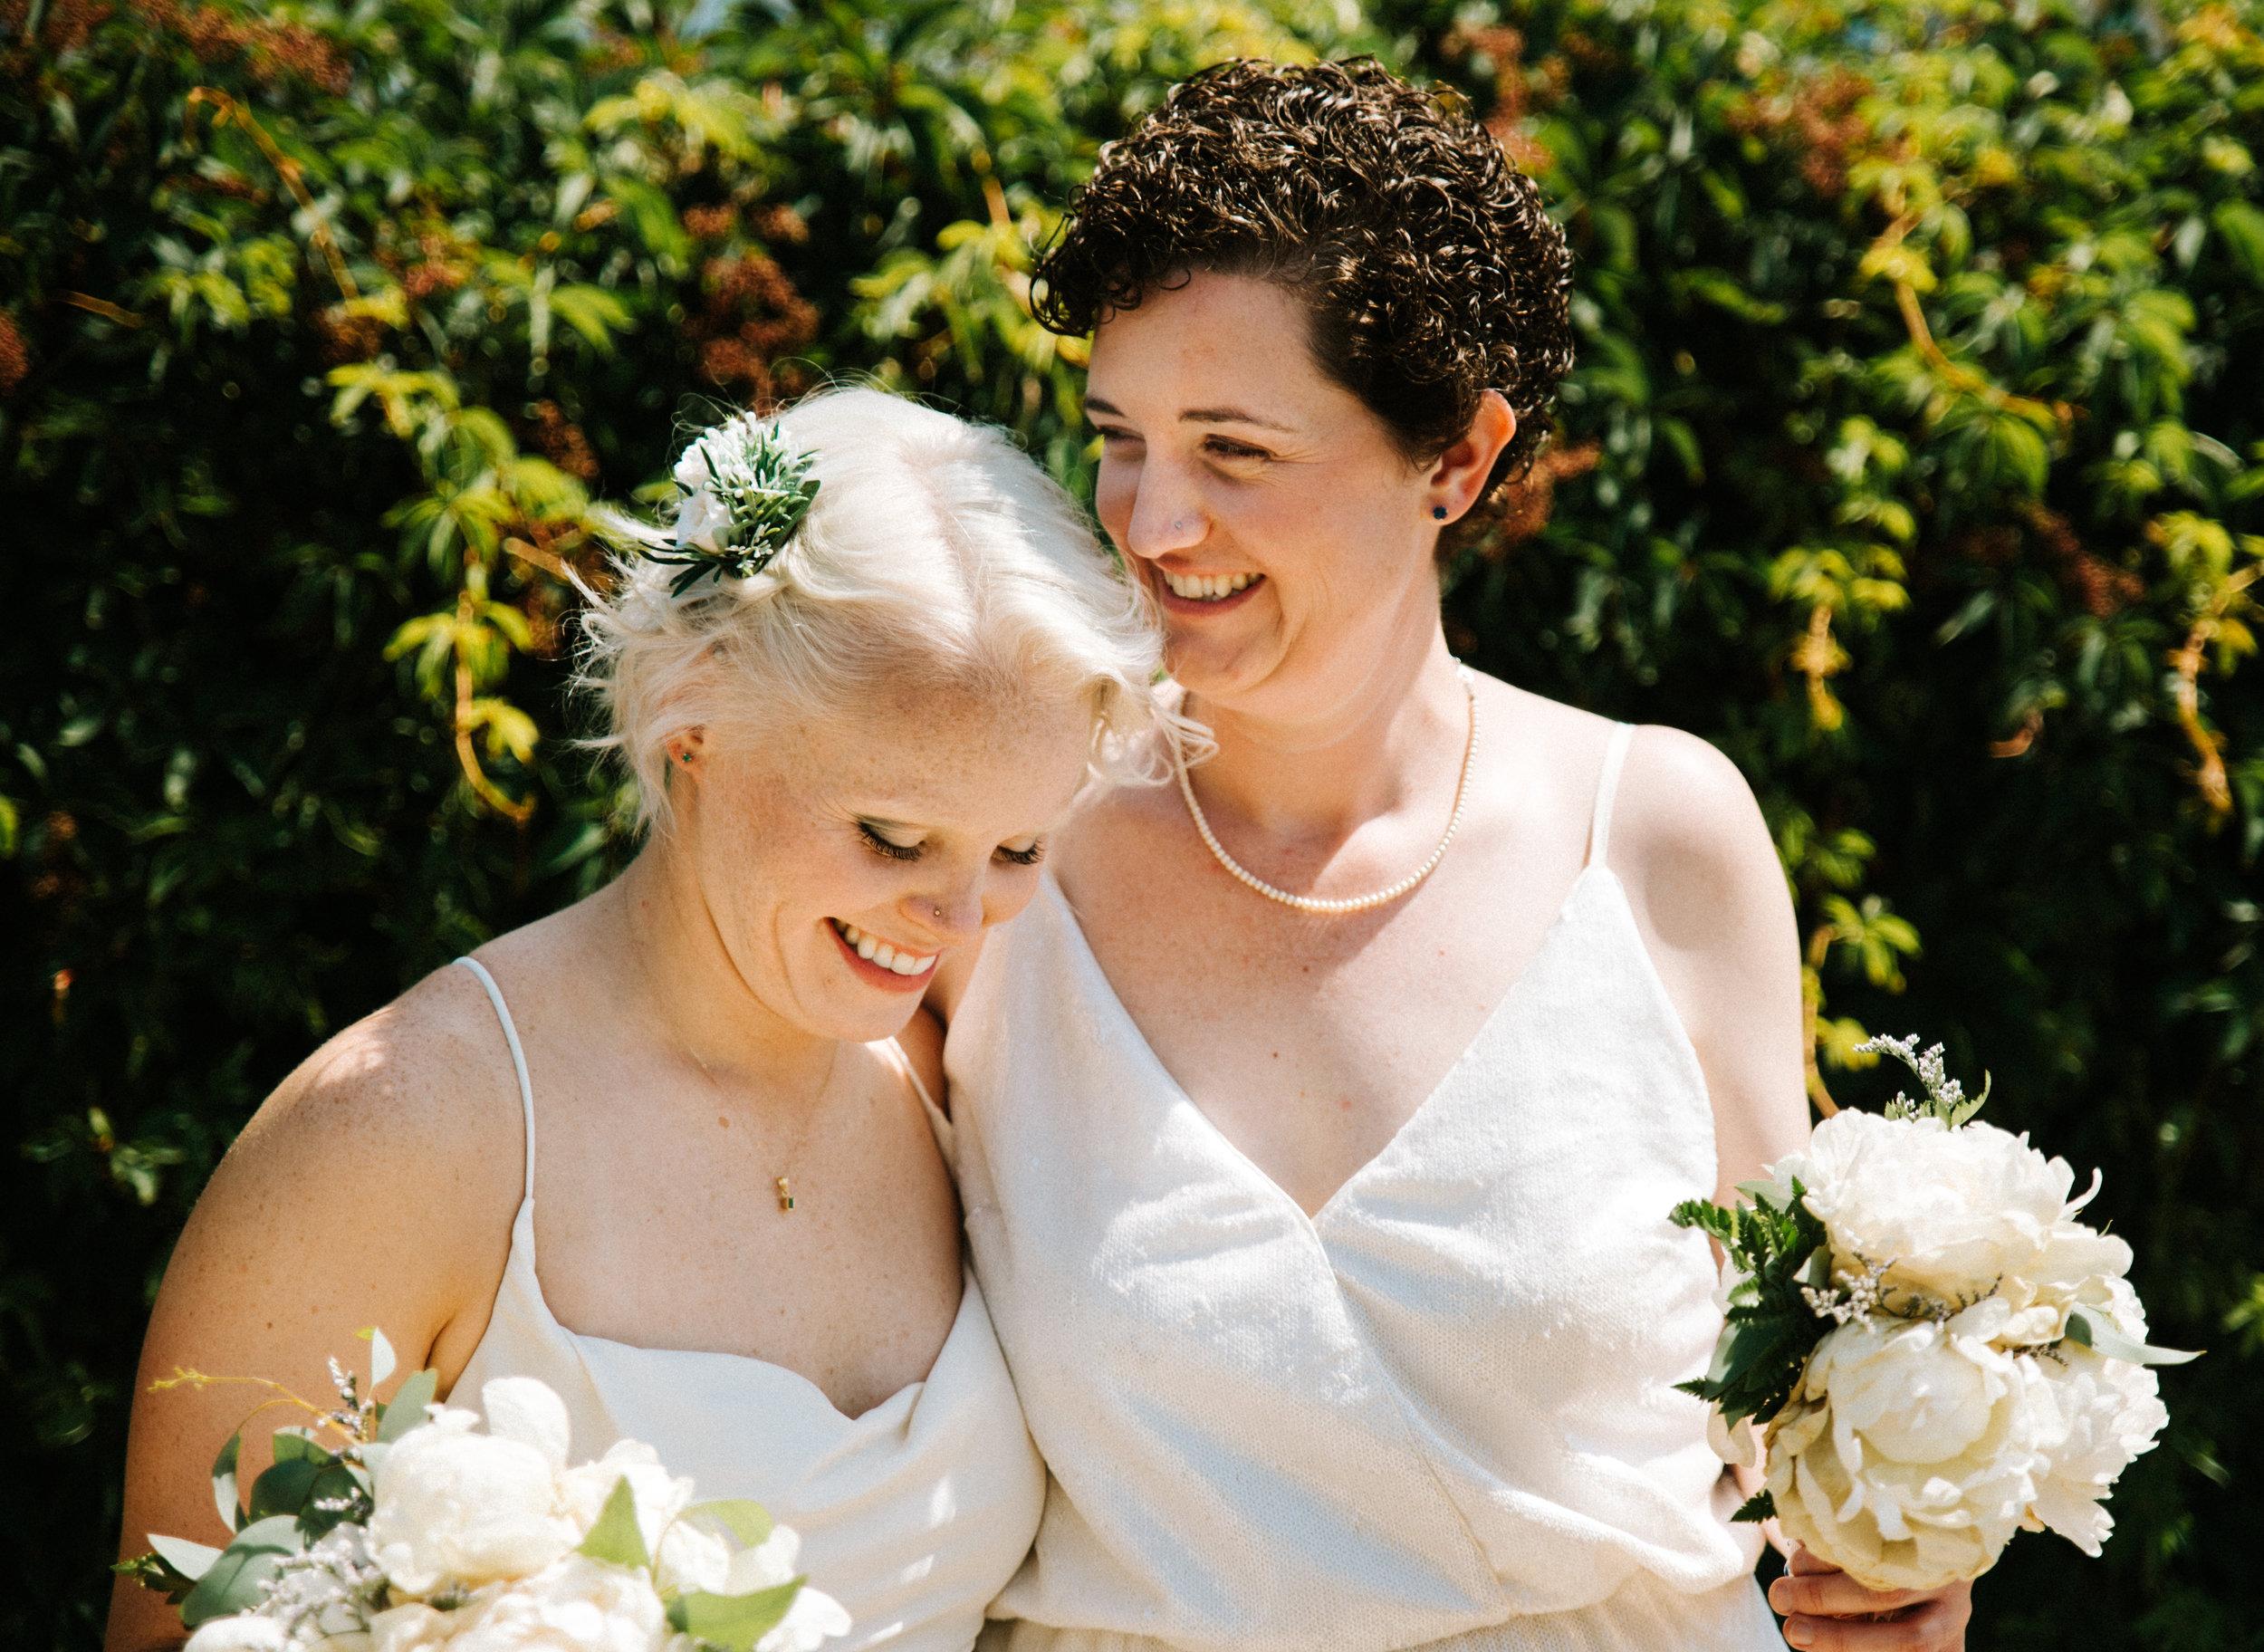 Outer Banks Wedding - Willmington NC Wedding Photographer - NC Wedding Photographer - NC Wedding - Beach Wedding - NC Beach Wedding - LGBTQ+ Wedding - LGBT Wedding - Lesbian Wedding-4858.jpg